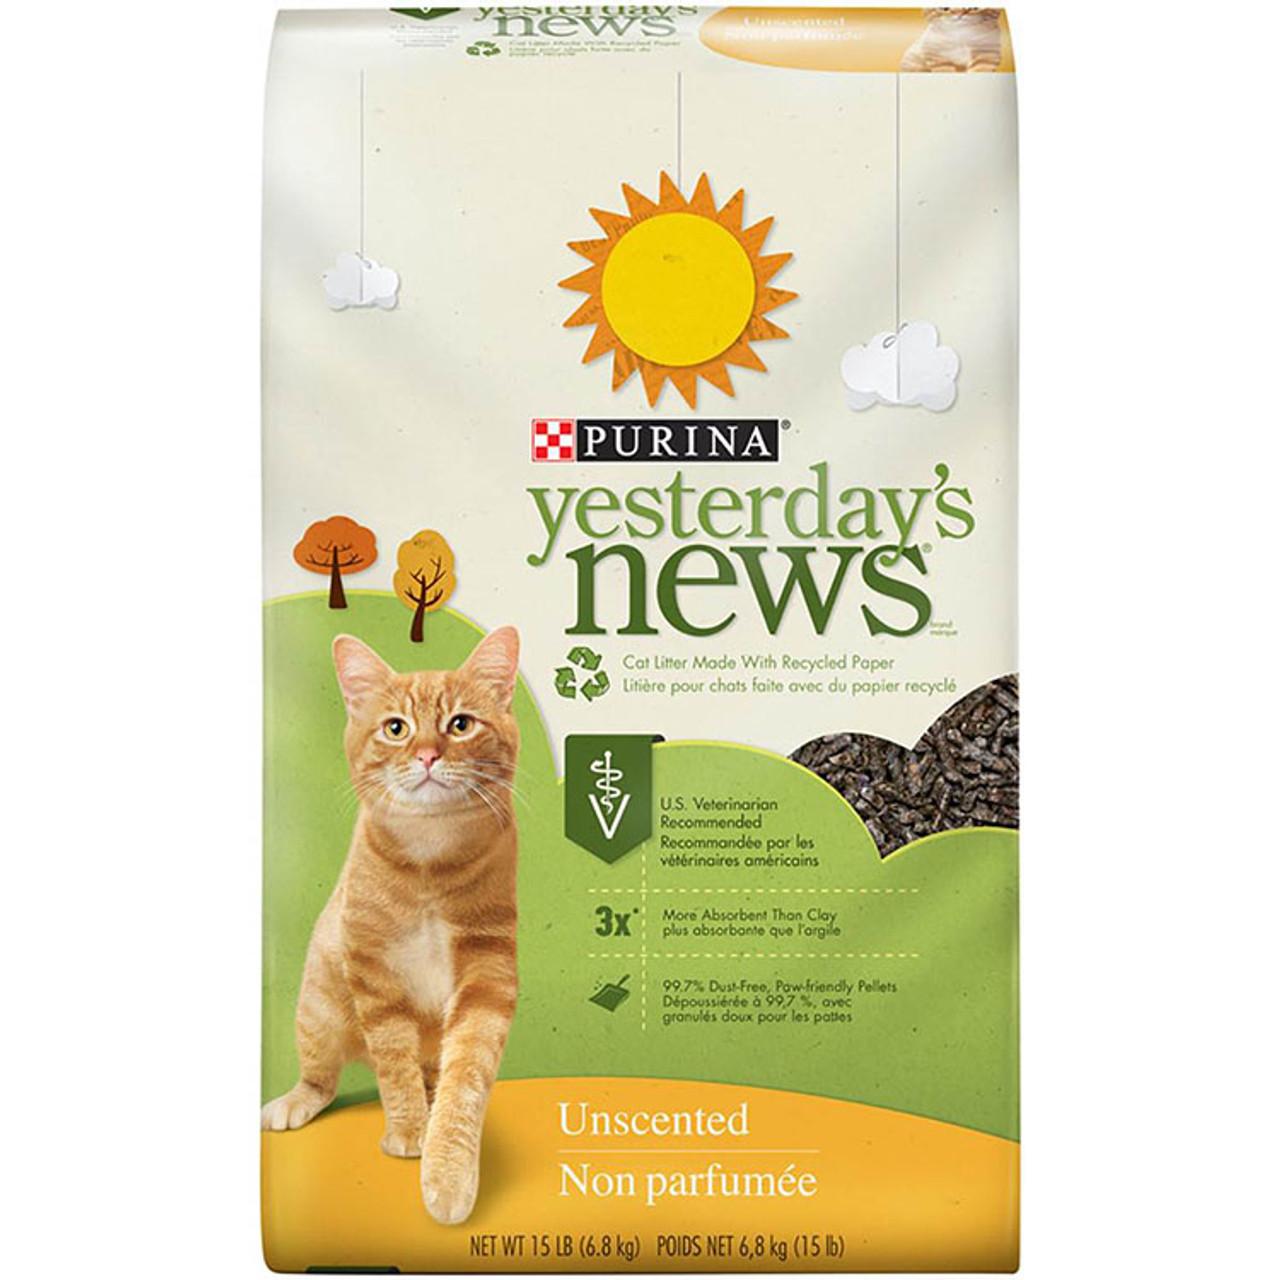 Purina Yesterdays News Original Cat Litter